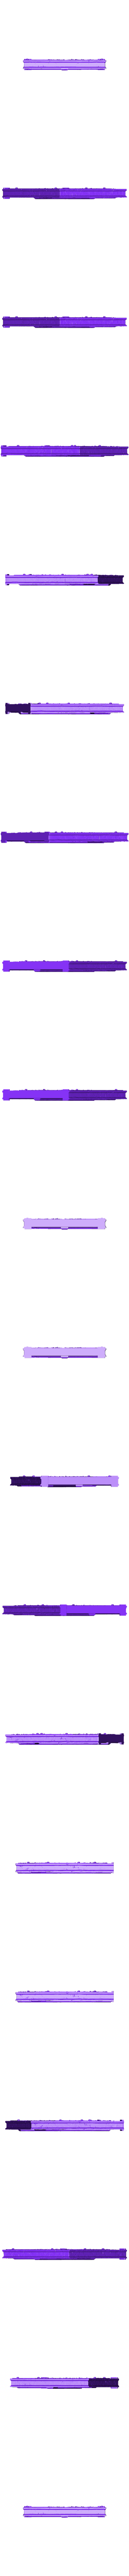 GS_Porch.stl Download STL file GAS STATION • 3D printing object, Txarli_Factory